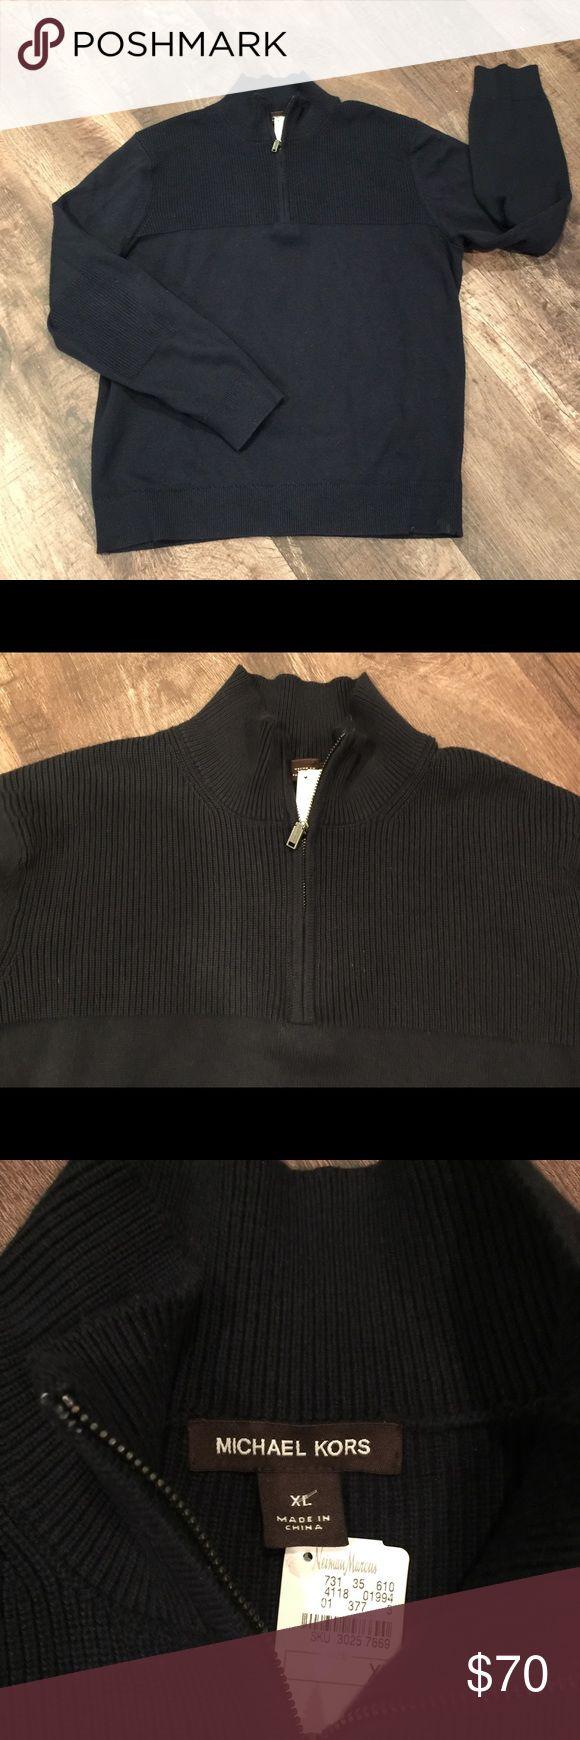 Men's half zip sweater (NWT) Michael Kors half zip navy blue sweater with a knit elbow patch. Michael Kors Sweaters